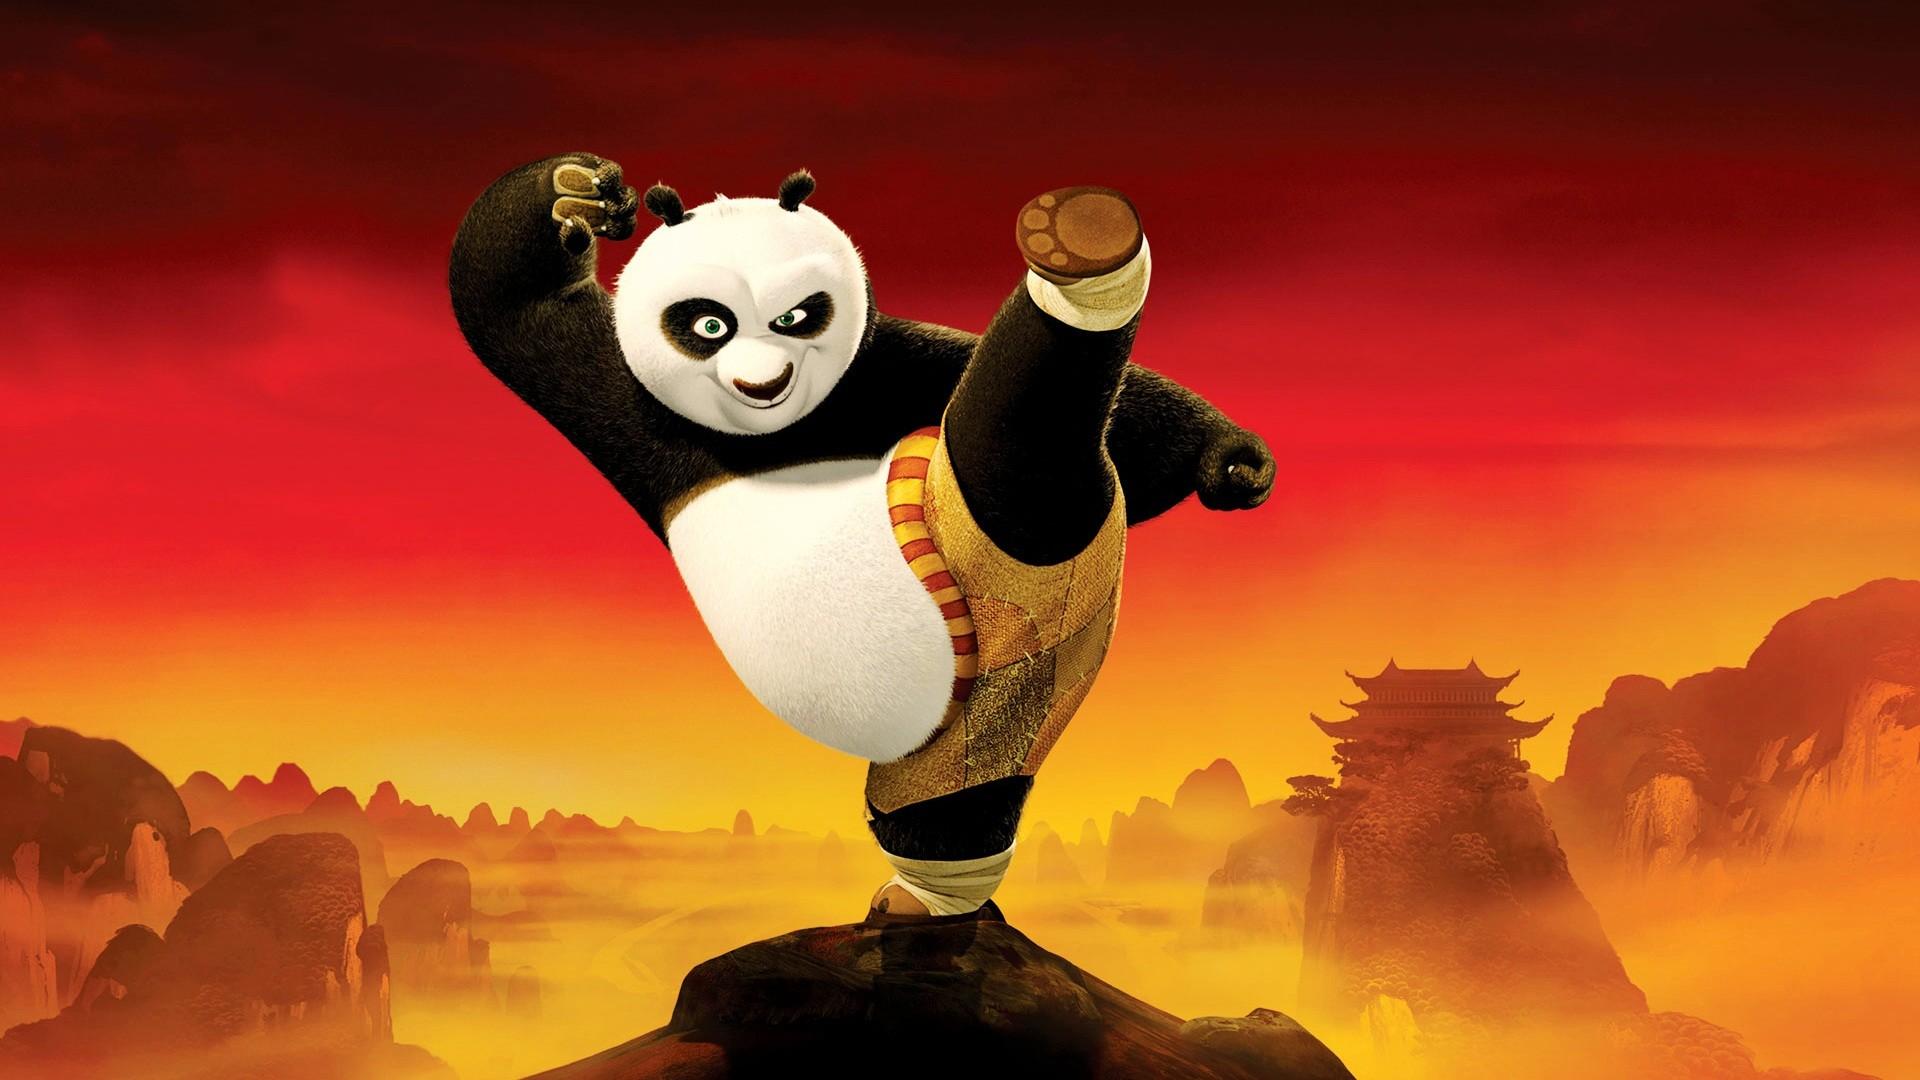 Kung Fu Panda 2 (2011) HD WallPaper – https://imashon.